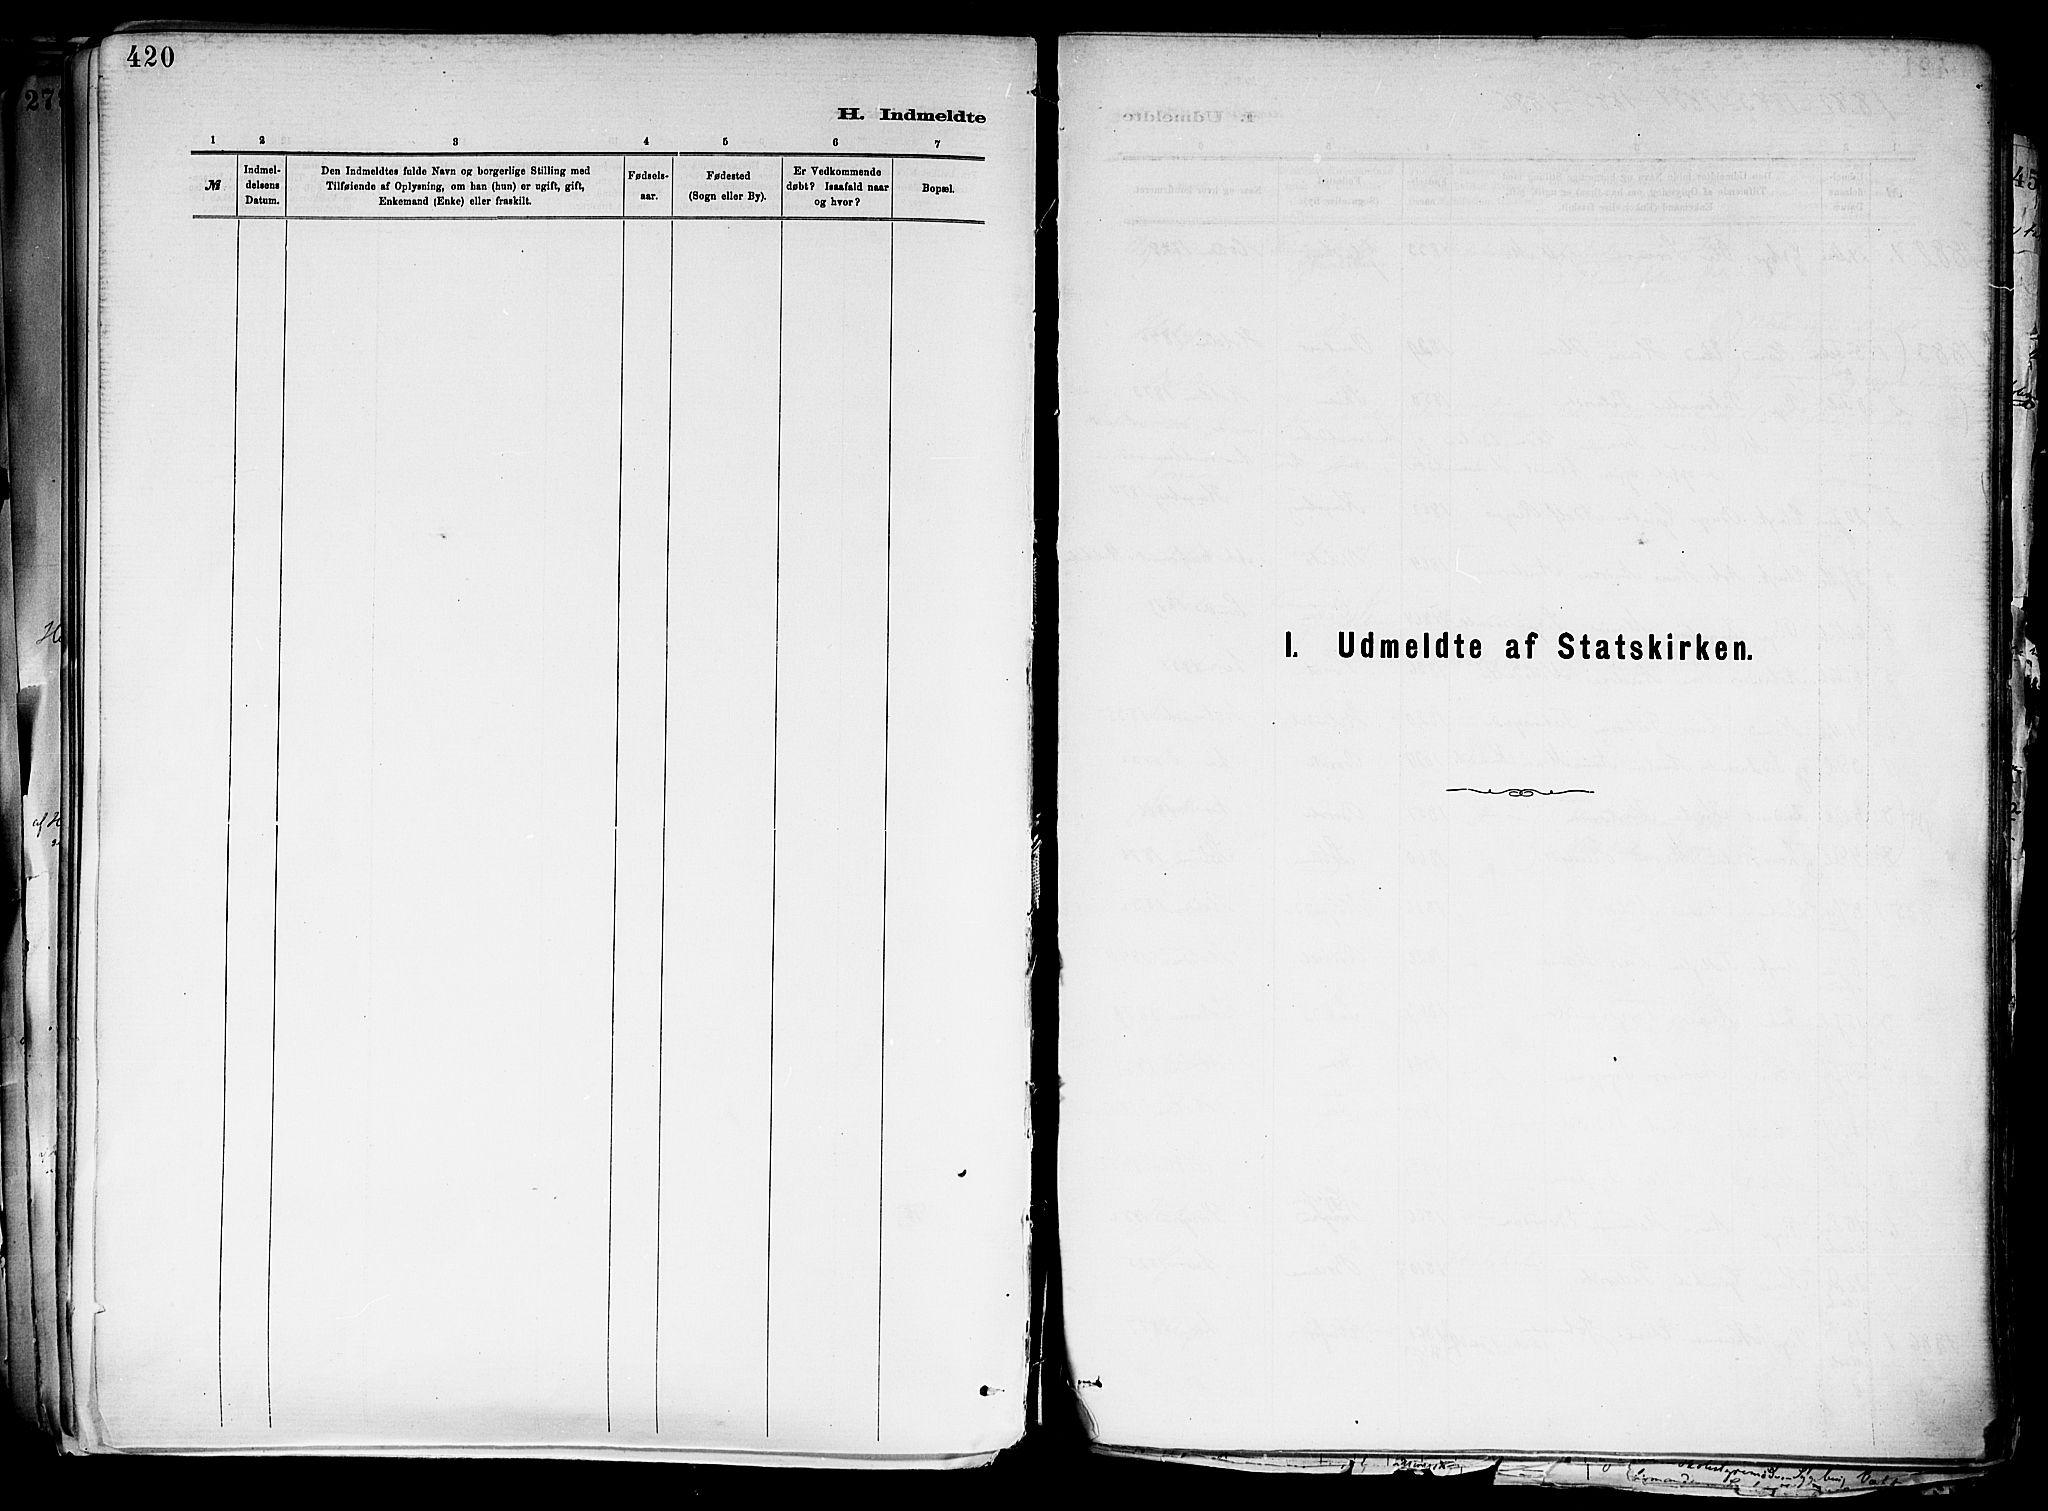 SAKO, Holla kirkebøker, F/Fa/L0008: Ministerialbok nr. 8, 1882-1897, s. 420